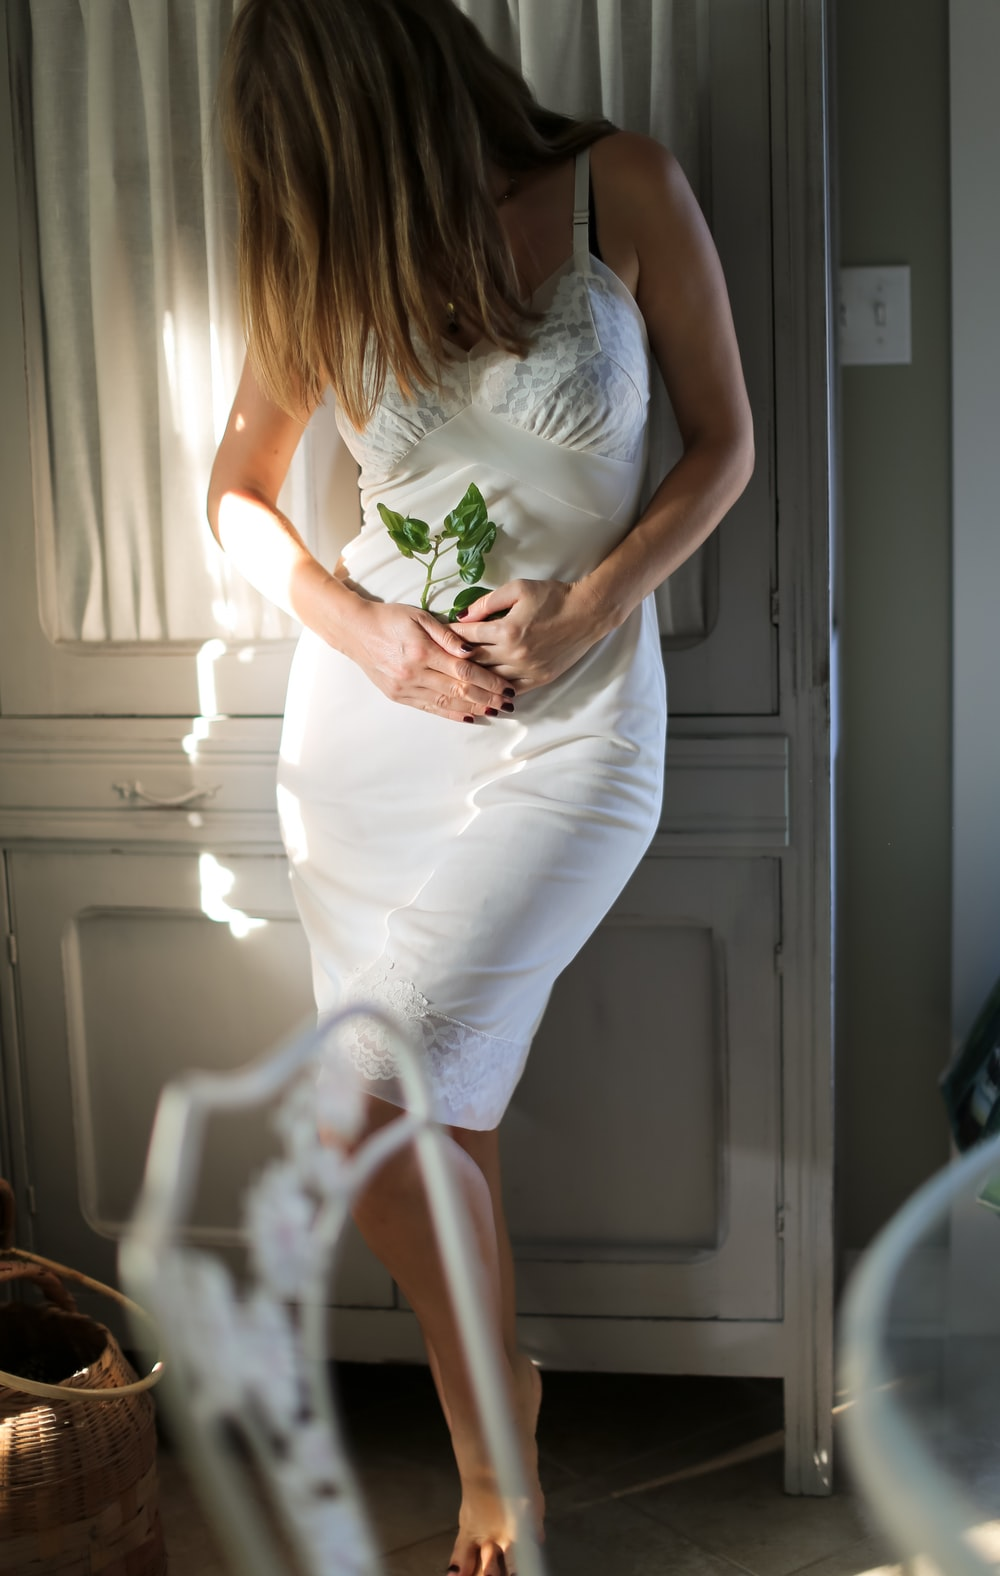 woman leaning on wardrobe